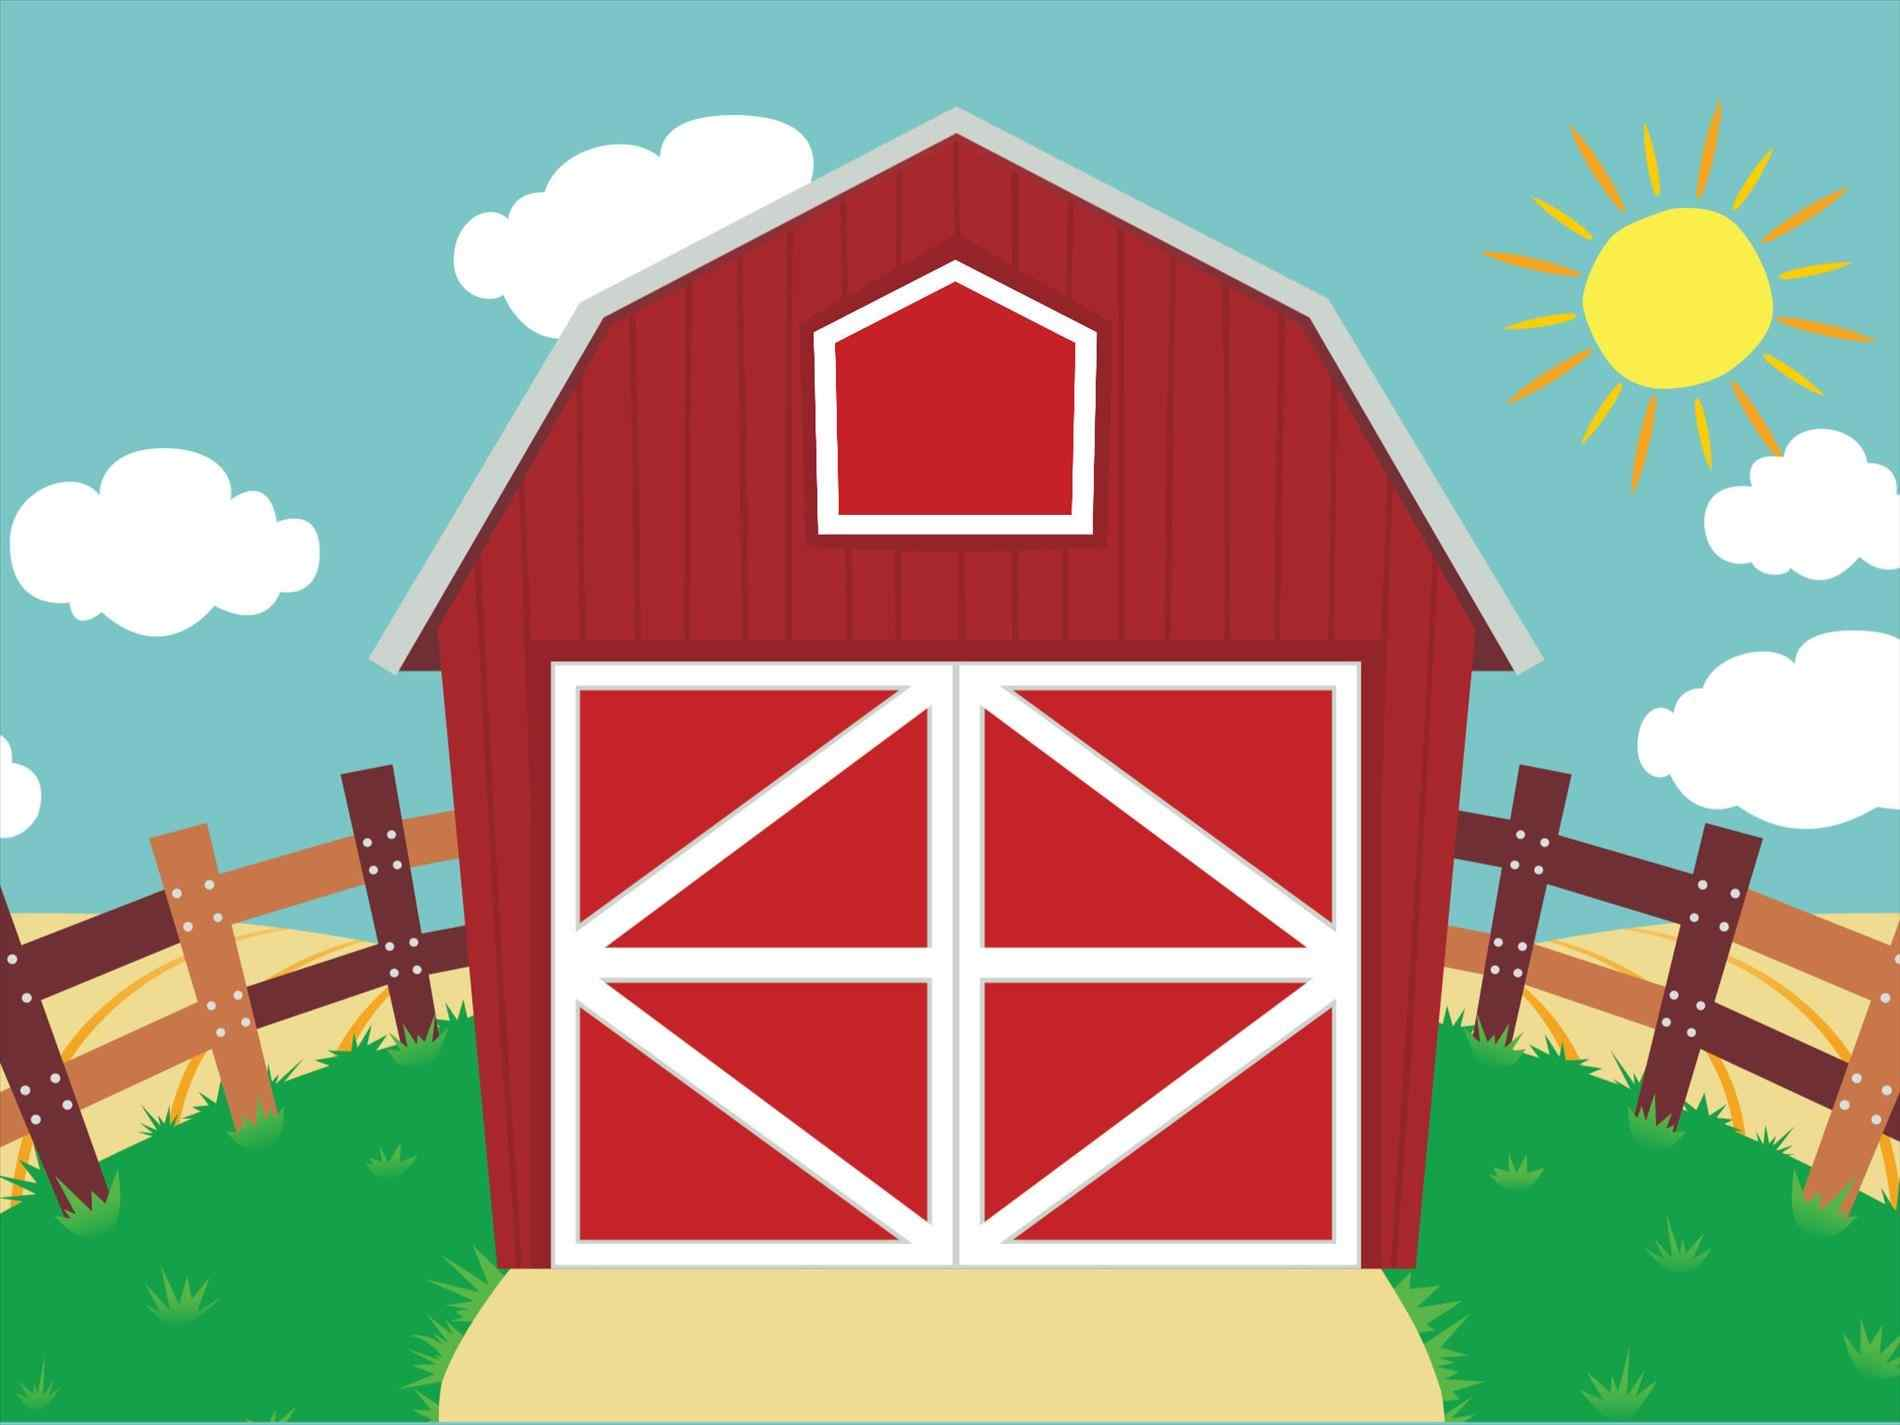 Barn clipart scene. Ipmserie background farm pencil